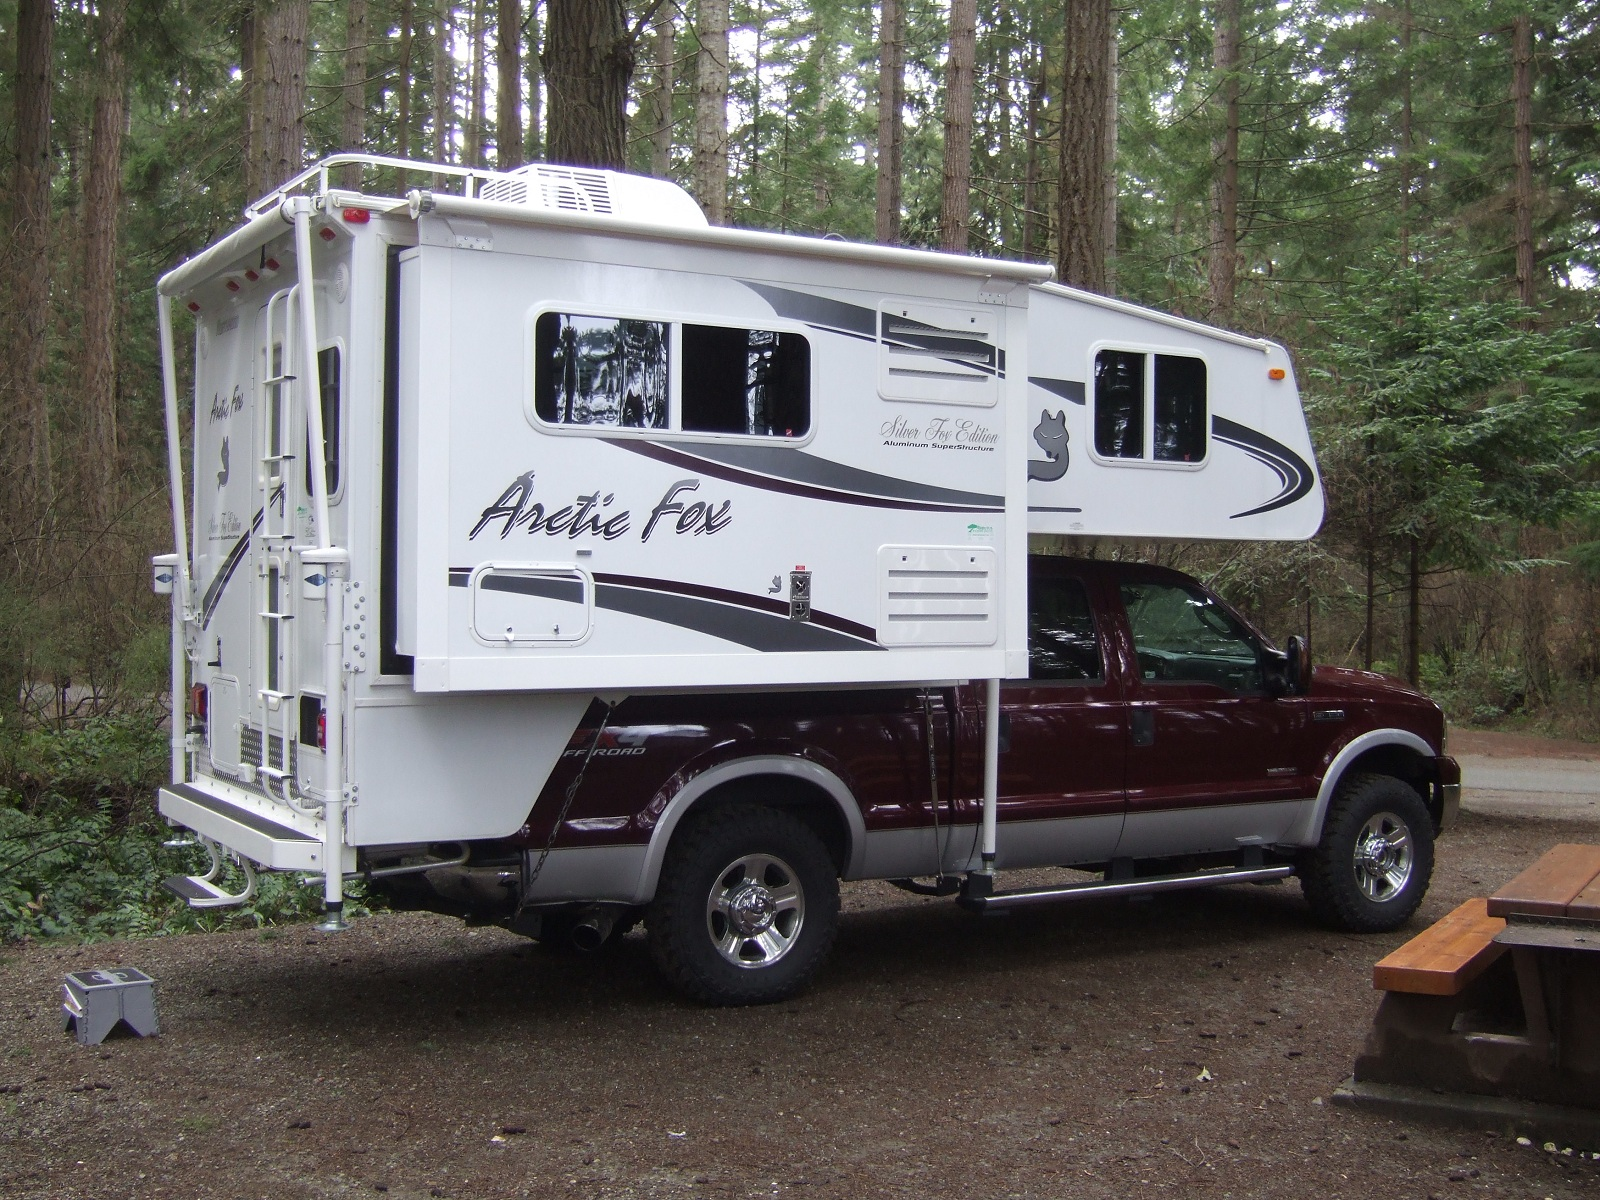 I think an ambulance would make a decent camper ...